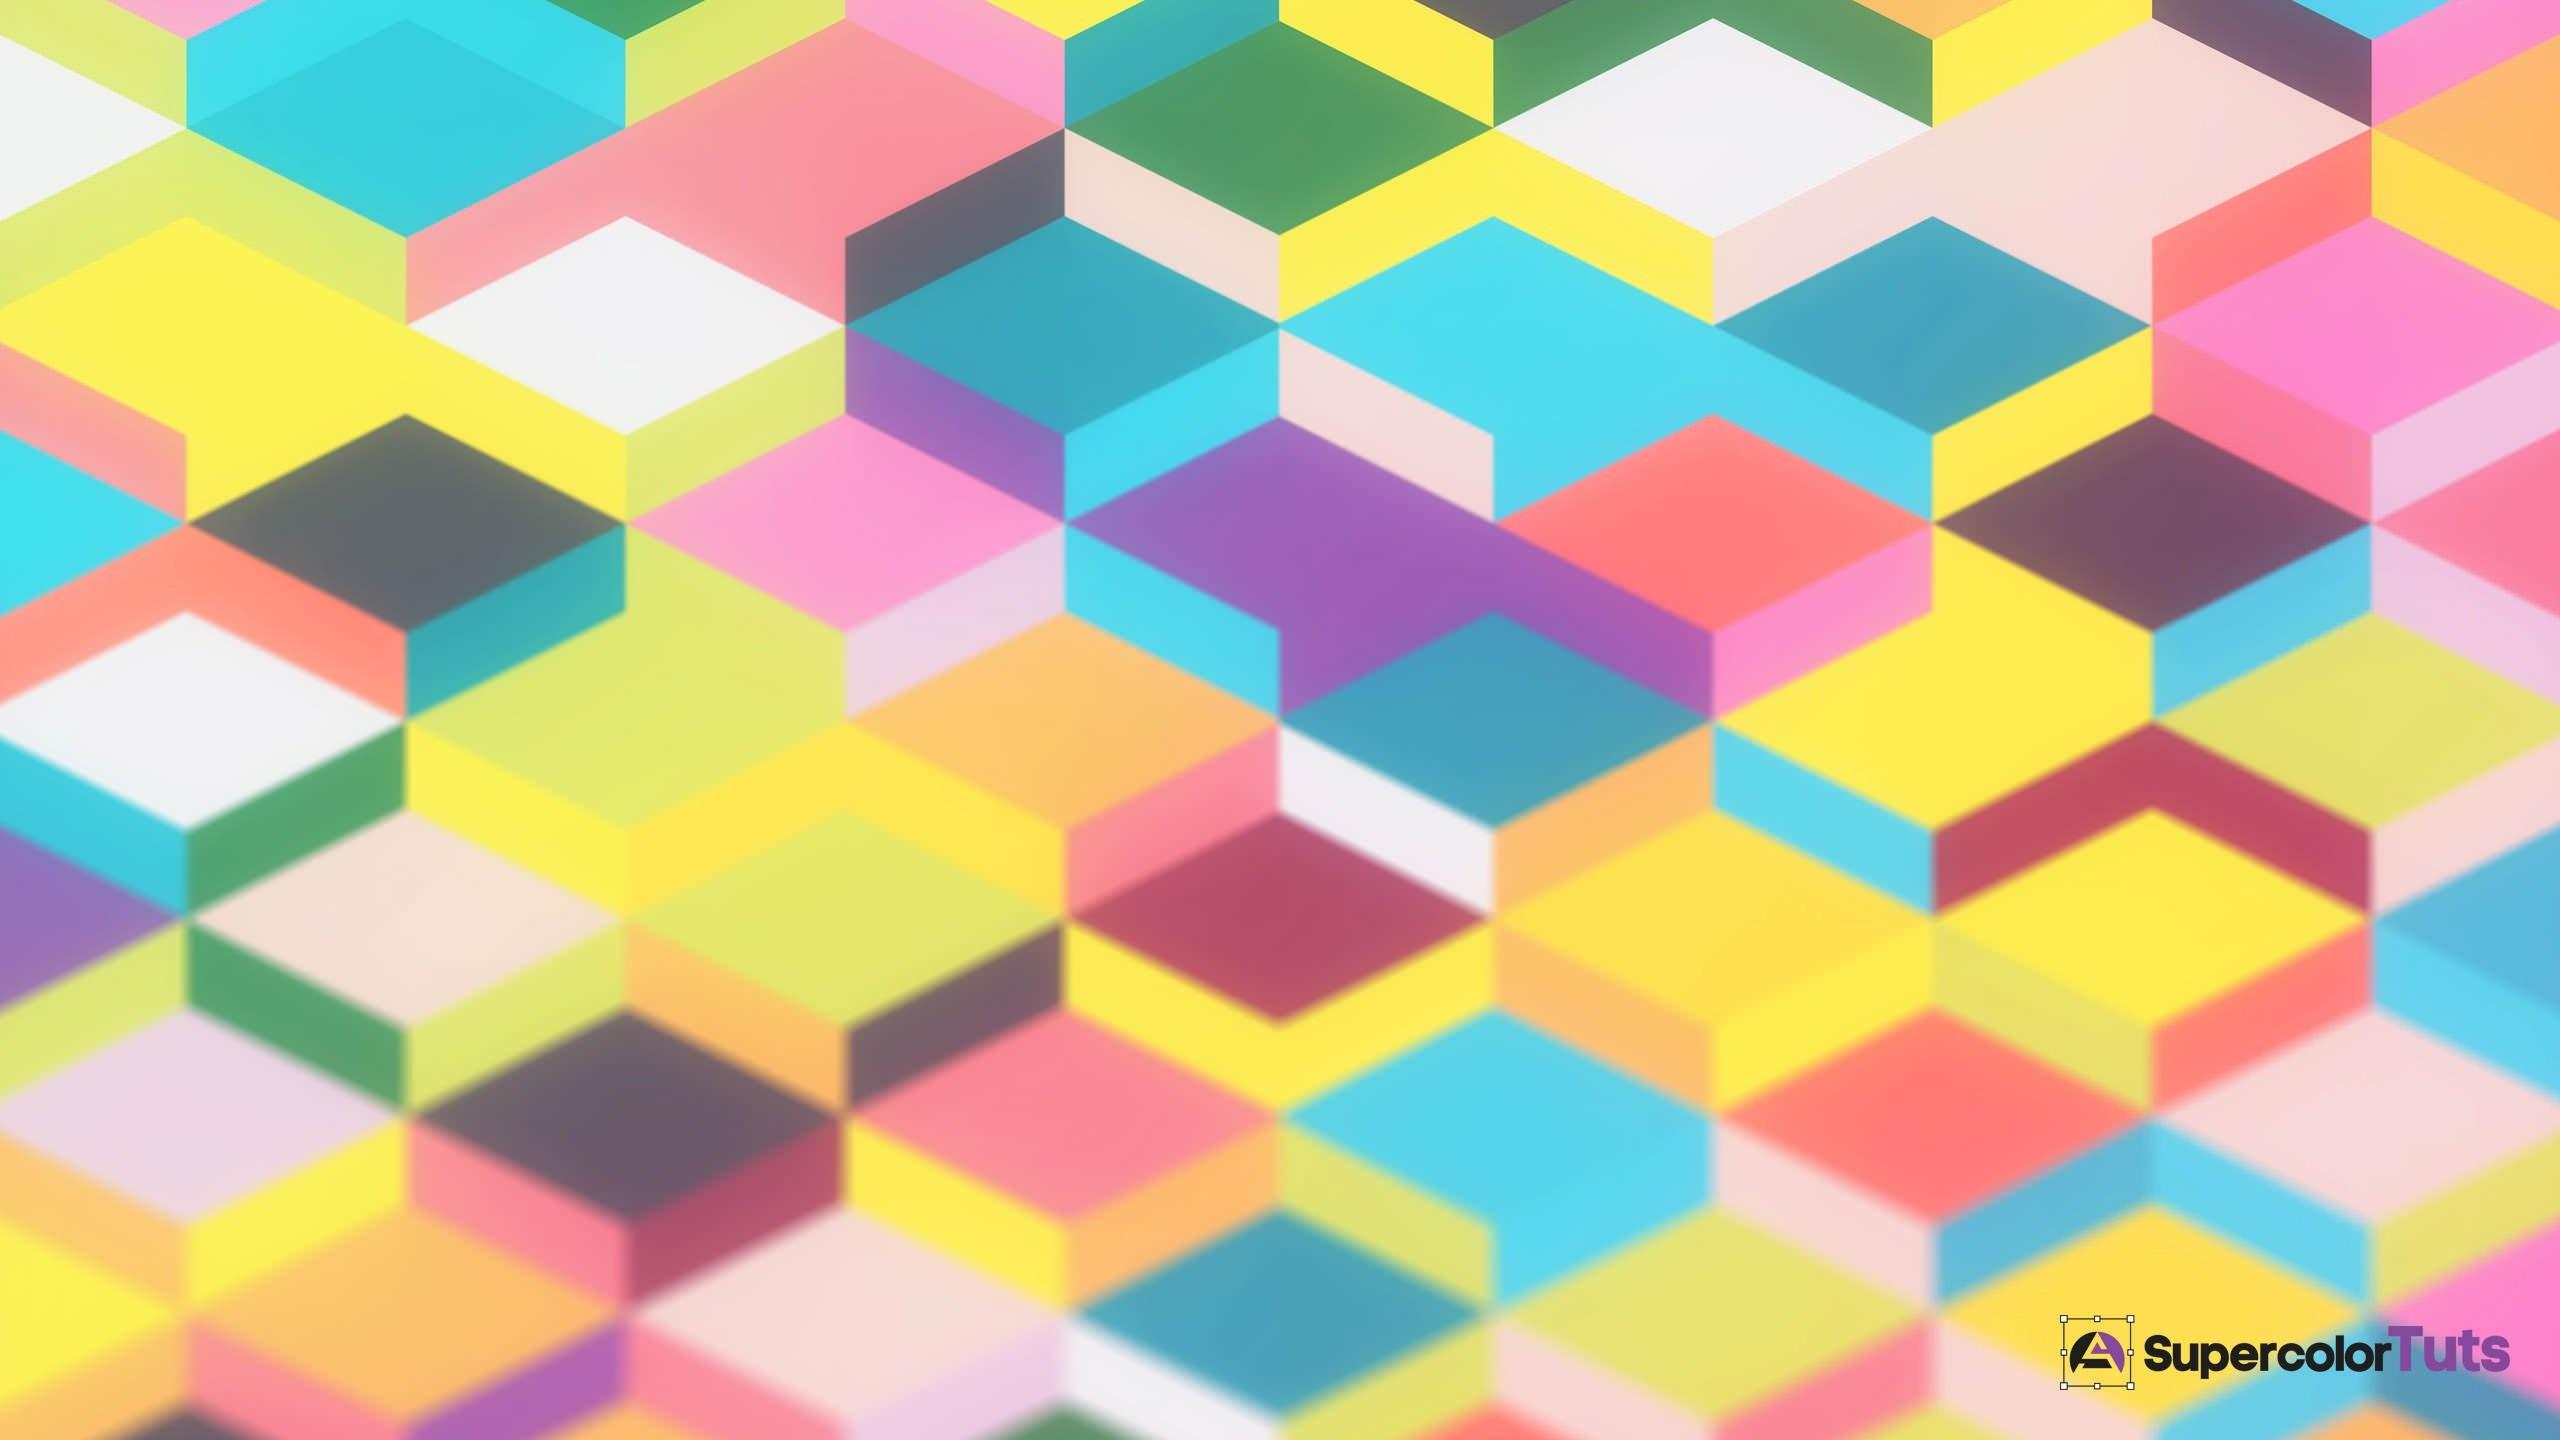 Free Colorful Geometric Wallpaper: Geometric Shapes Wallpaper (68+ Images